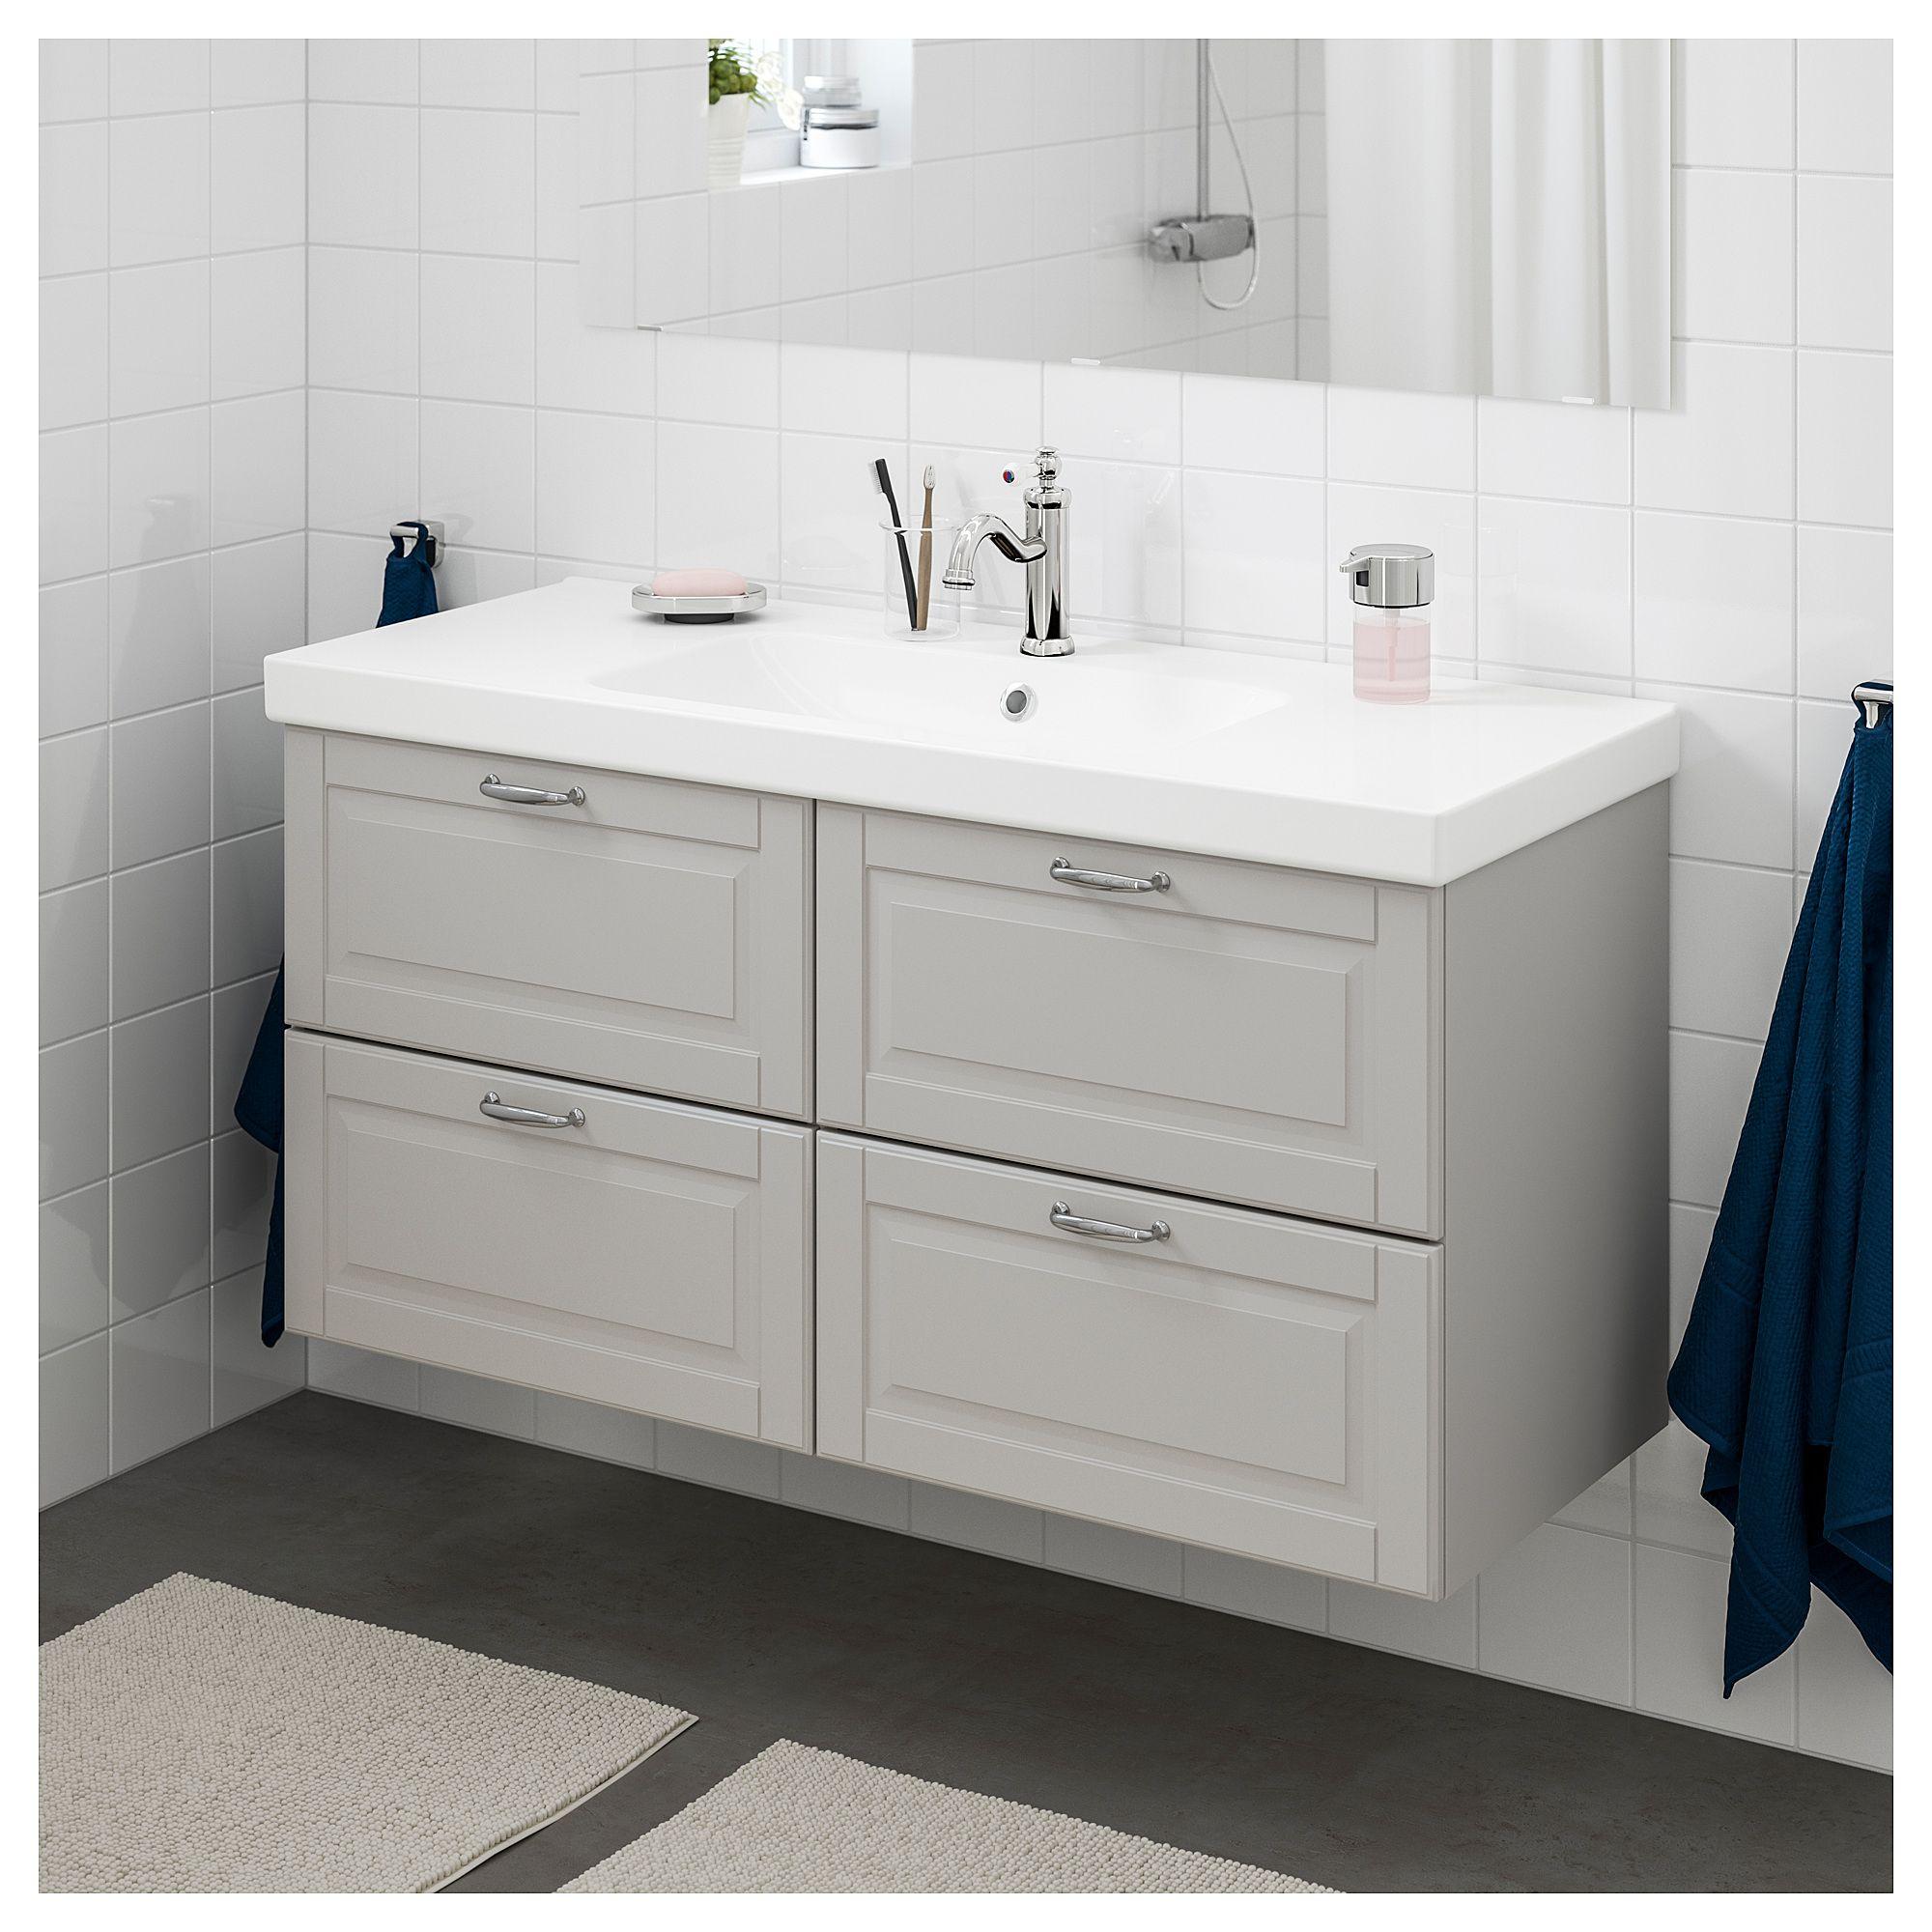 Furniture And Home Furnishings Bathroom Vanity Ikea Godmorgon